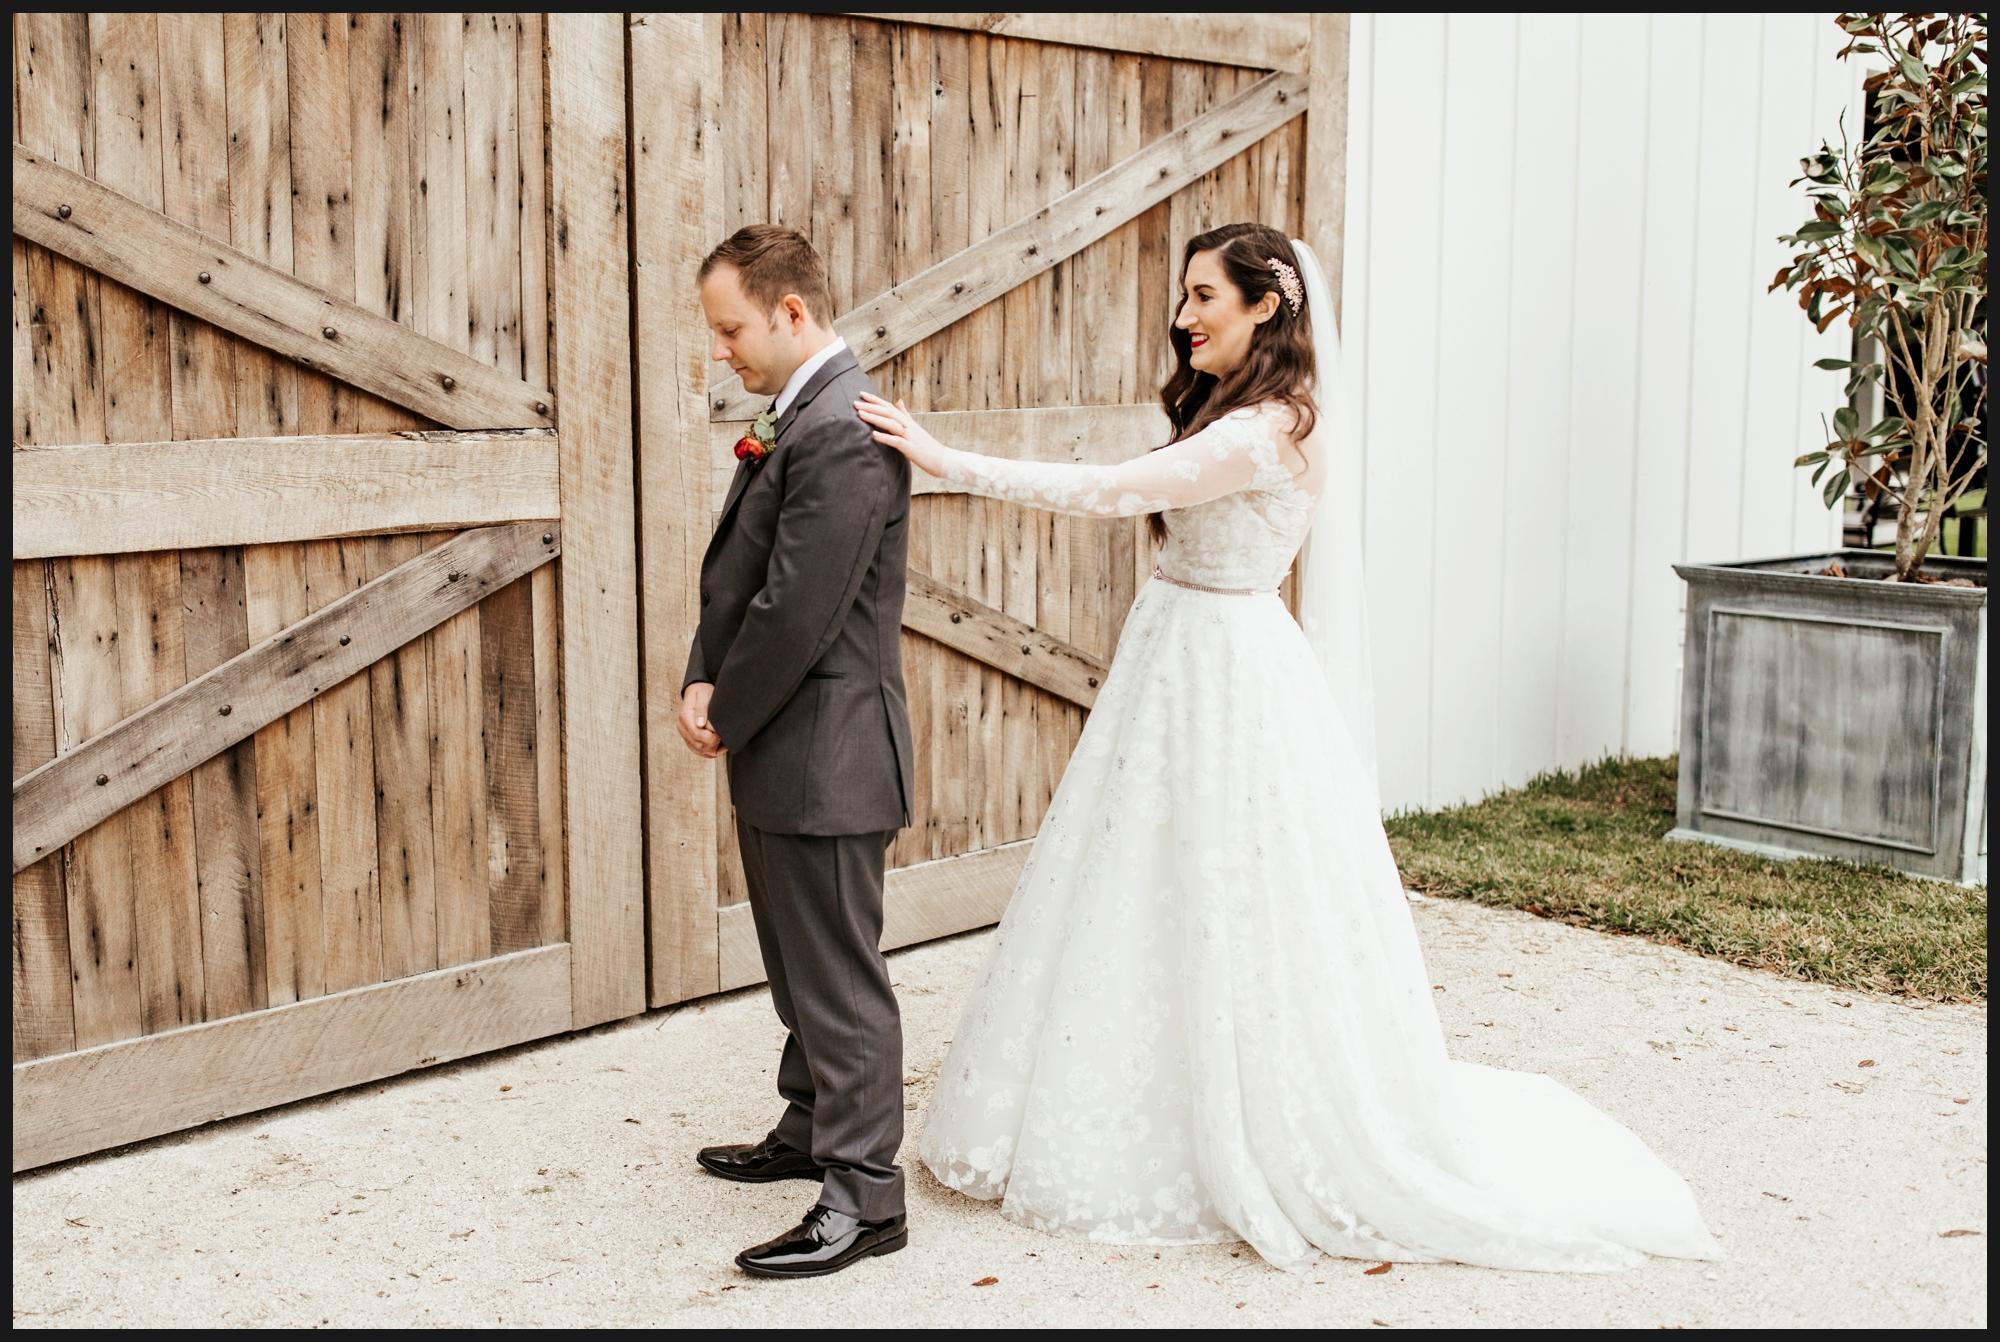 Orlando-Wedding-Photographer-destination-wedding-photographer-florida-wedding-photographer-hawaii-wedding-photographer_0505.jpg